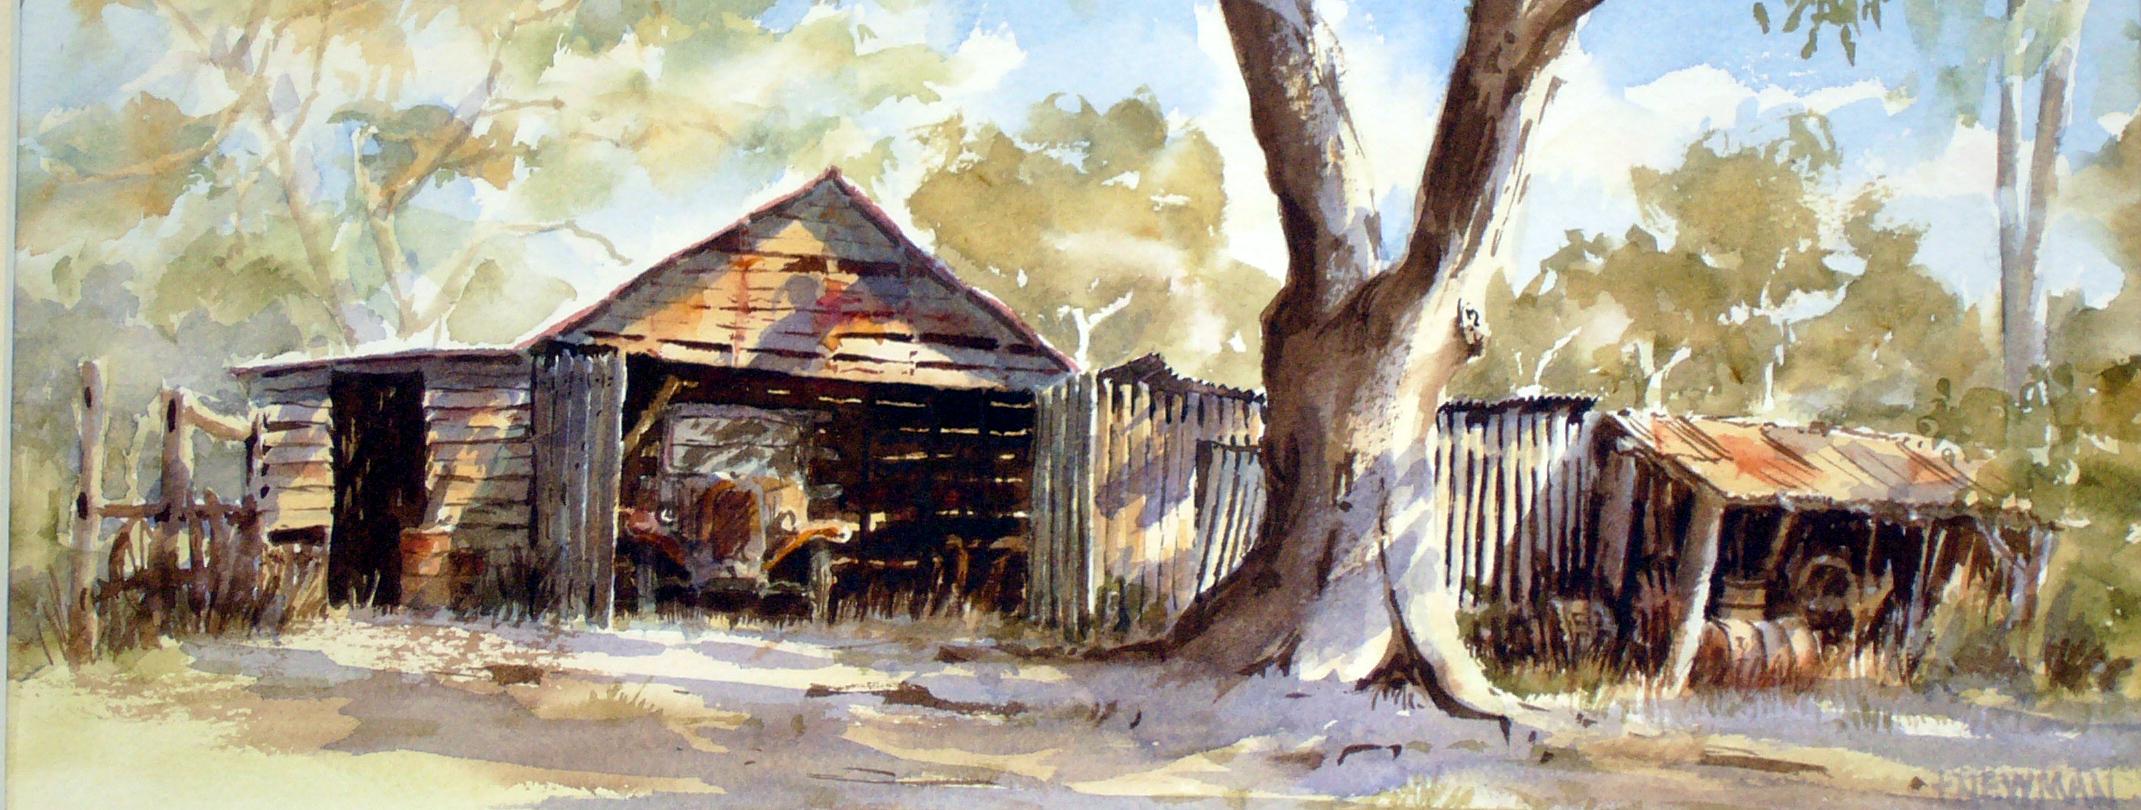 Outback Australia John Newman